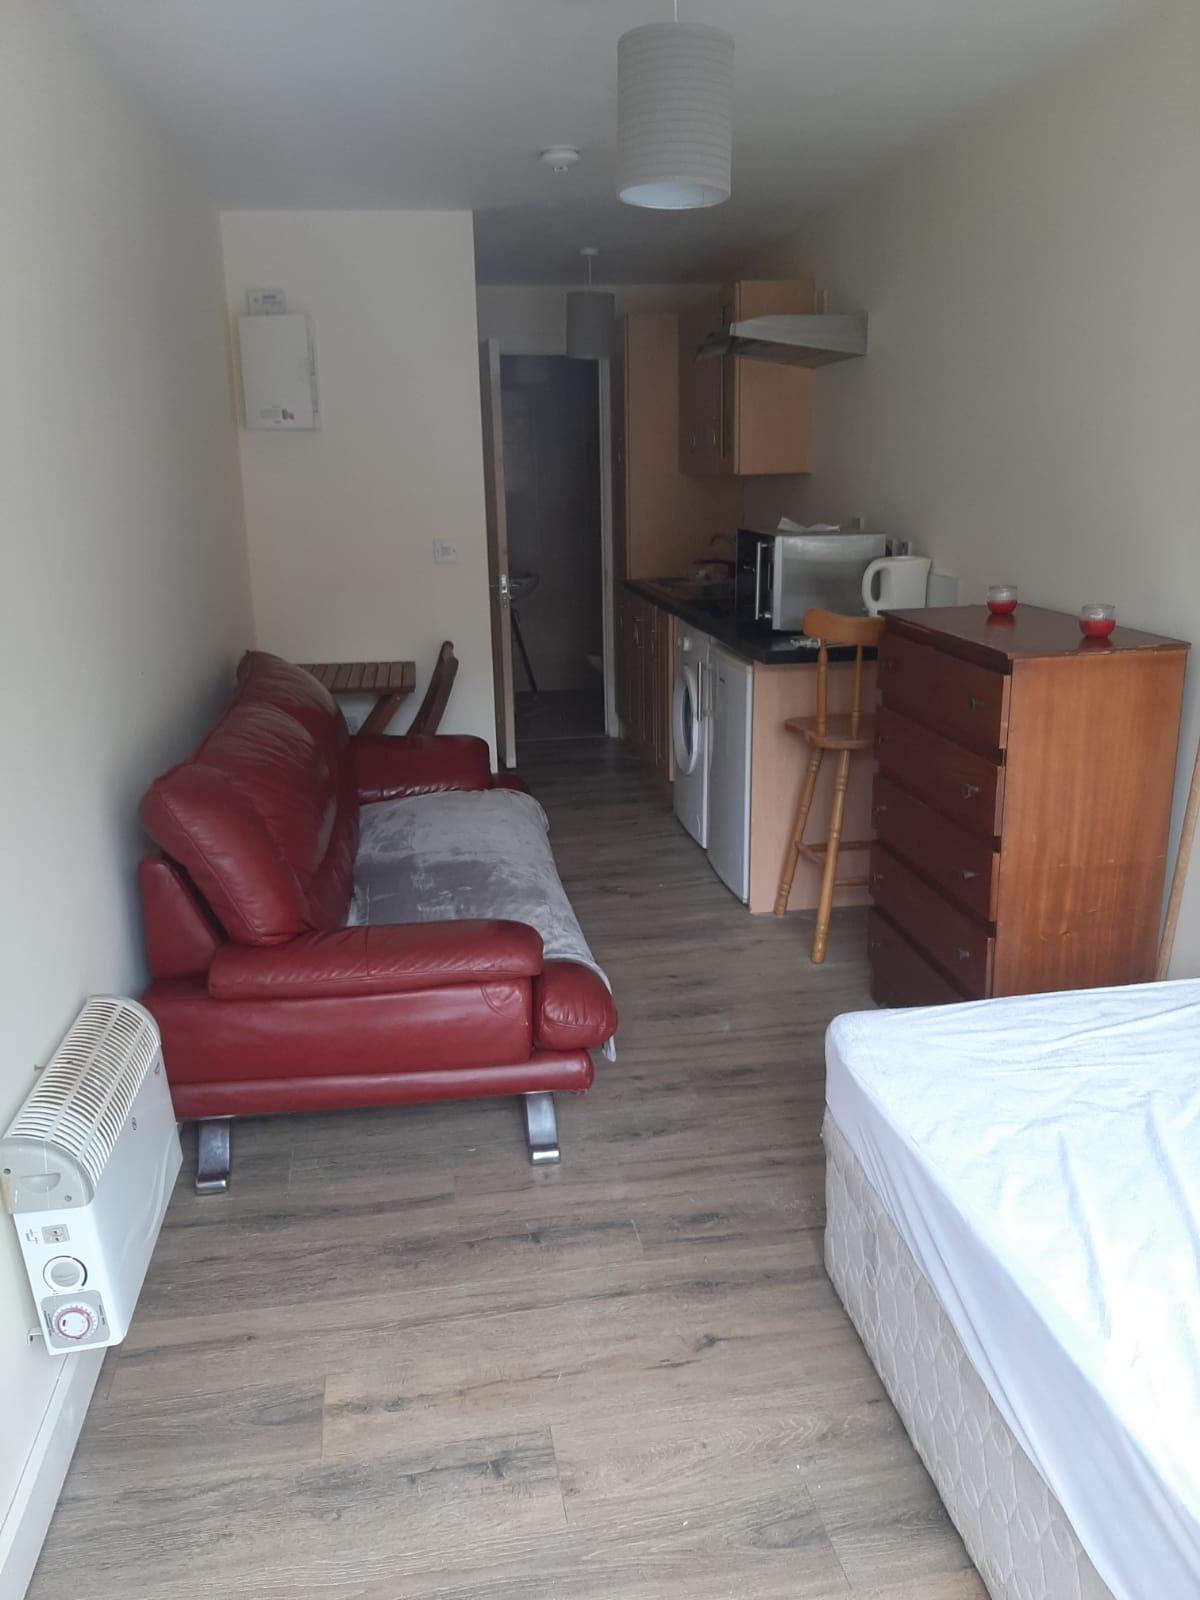 Ashlawn One Room Apartment